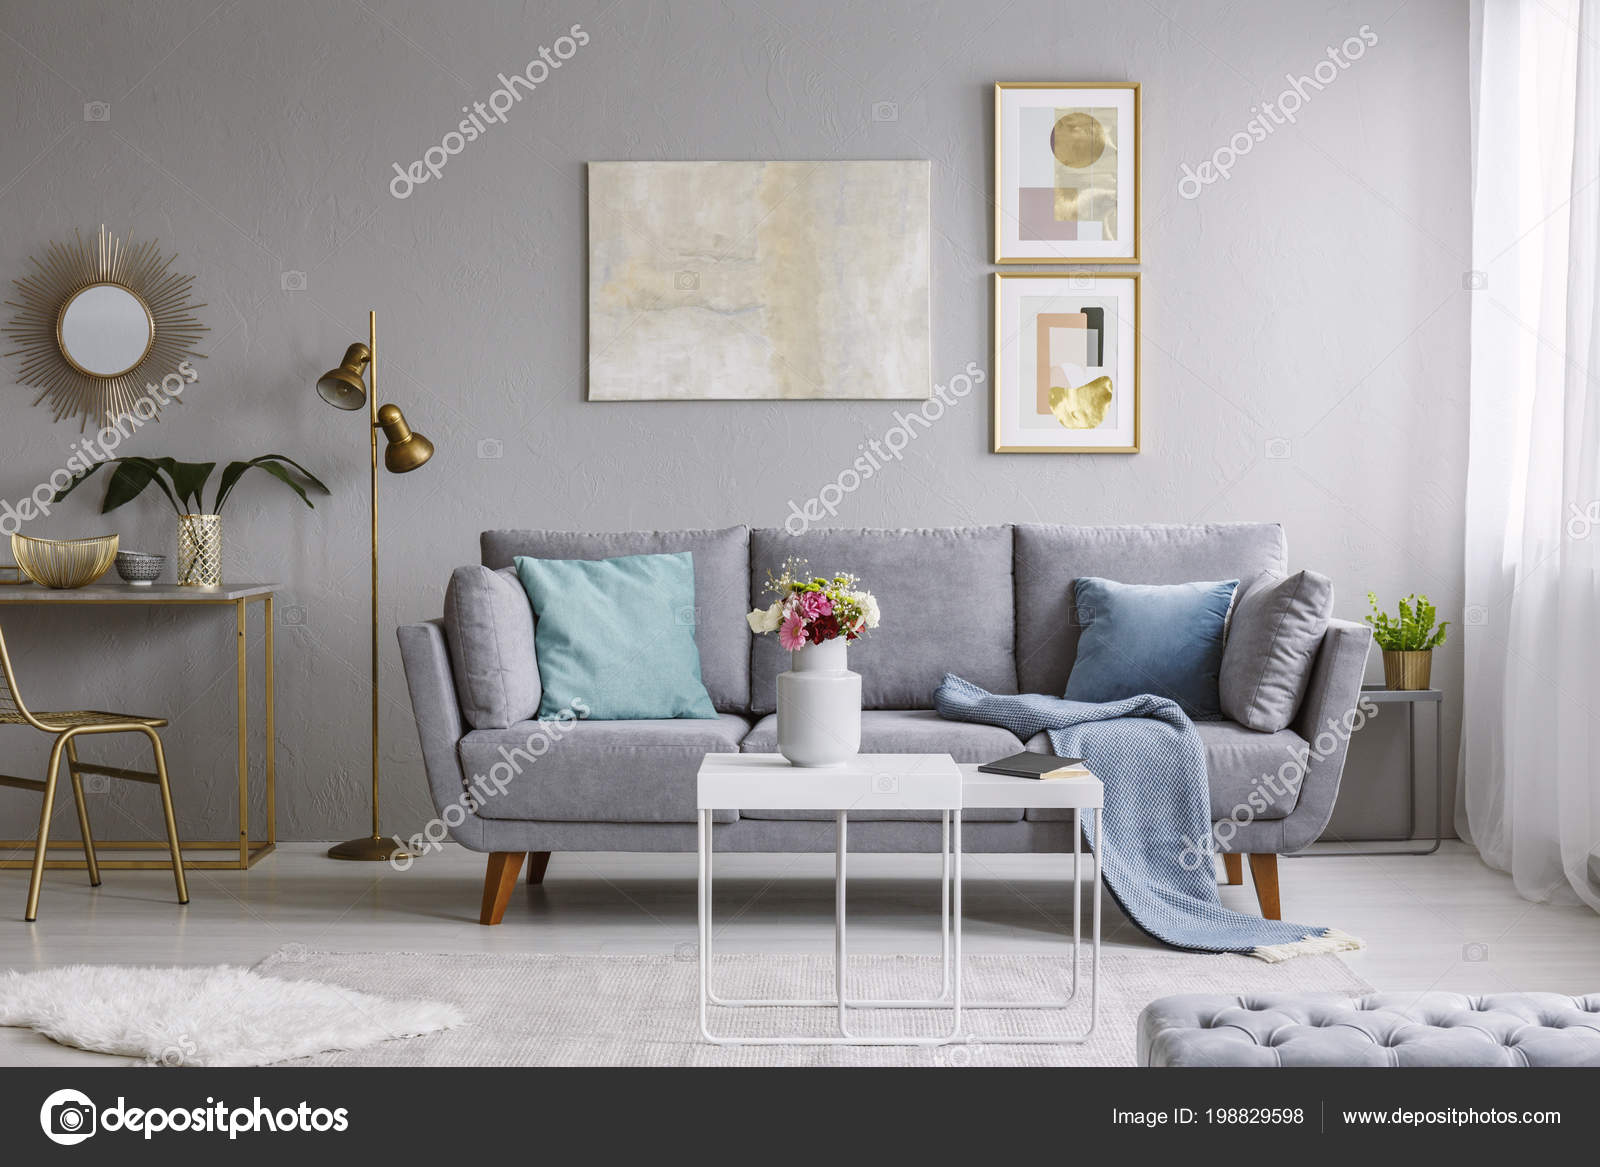 https://st4.depositphotos.com/2249091/19882/i/1600/depositphotos_198829598-stockafbeelding-bloemen-tafel-grijs-plat-interieur.jpg